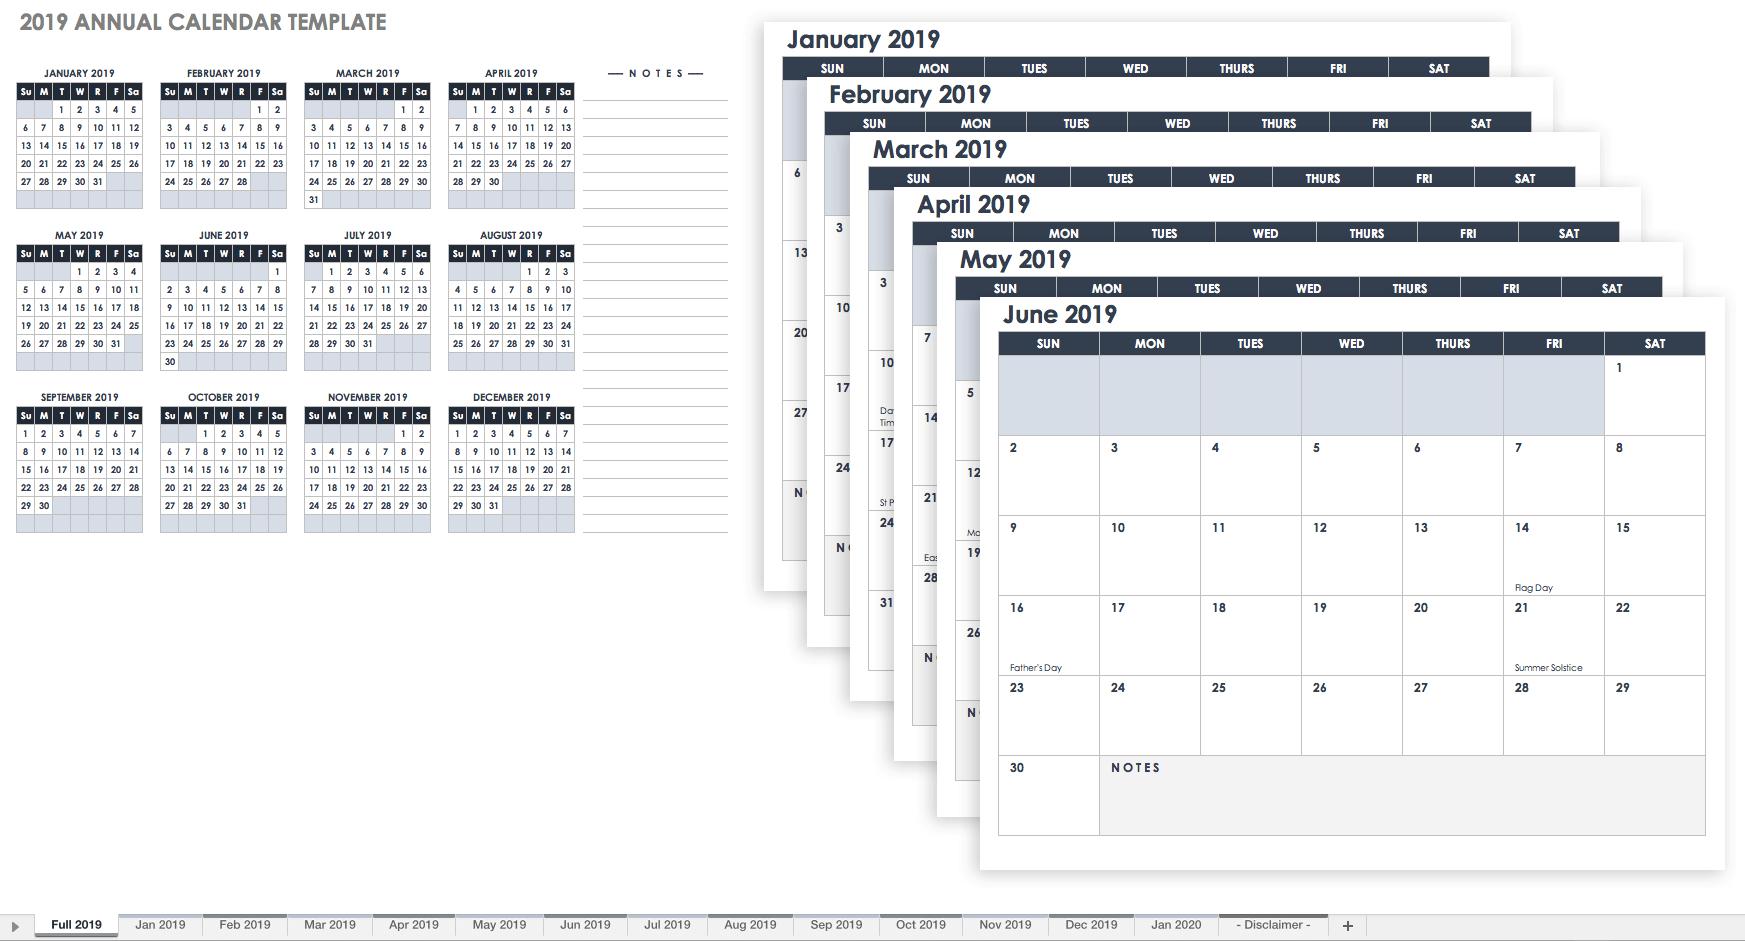 15 Free Monthly Calendar Templates | Smartsheet with regard to Monthly Calendar Templates 12 Months